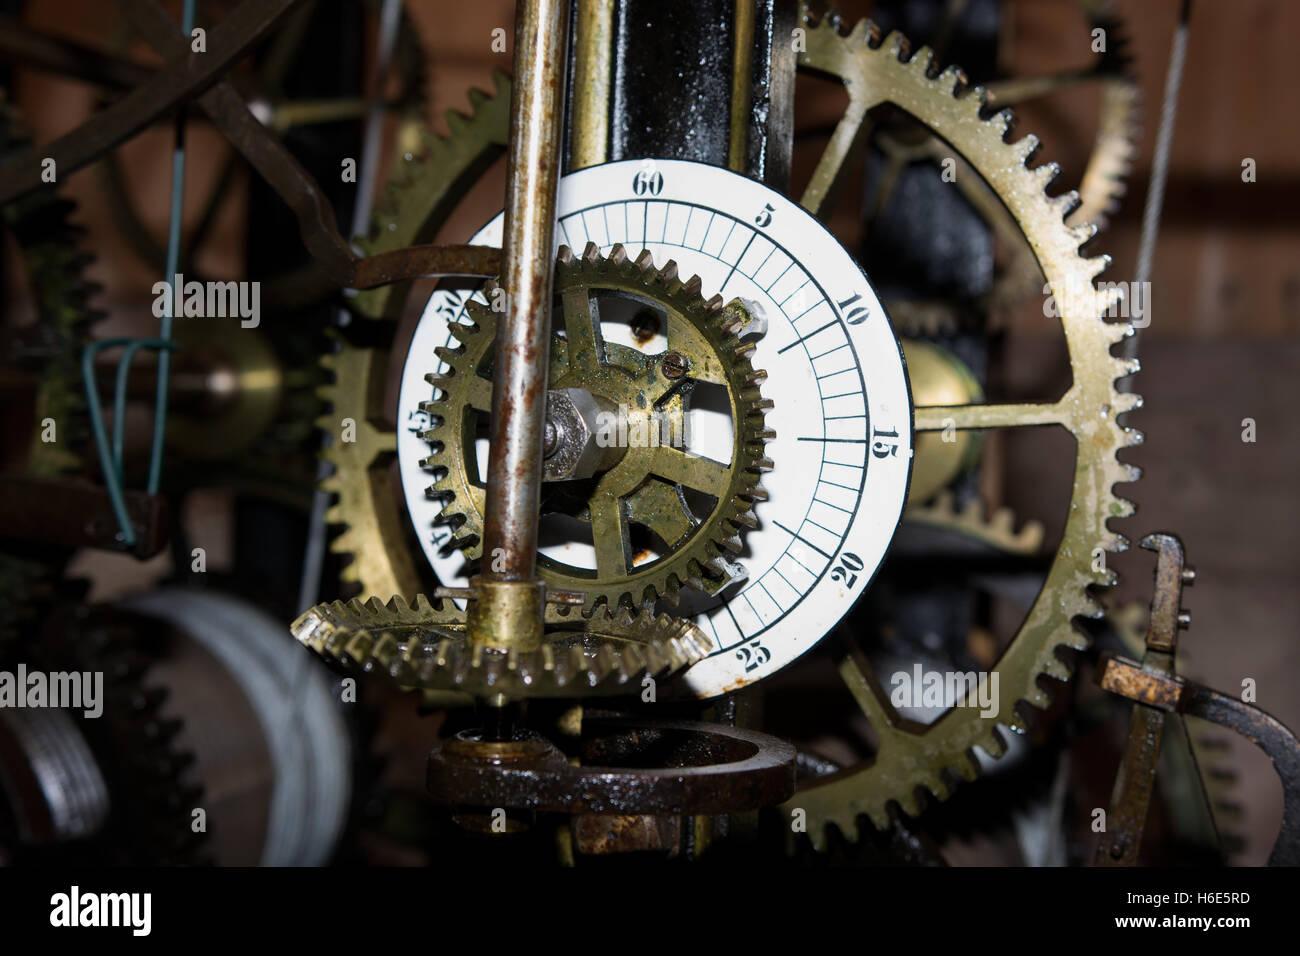 old clockworck with cog wheels - Stock Image